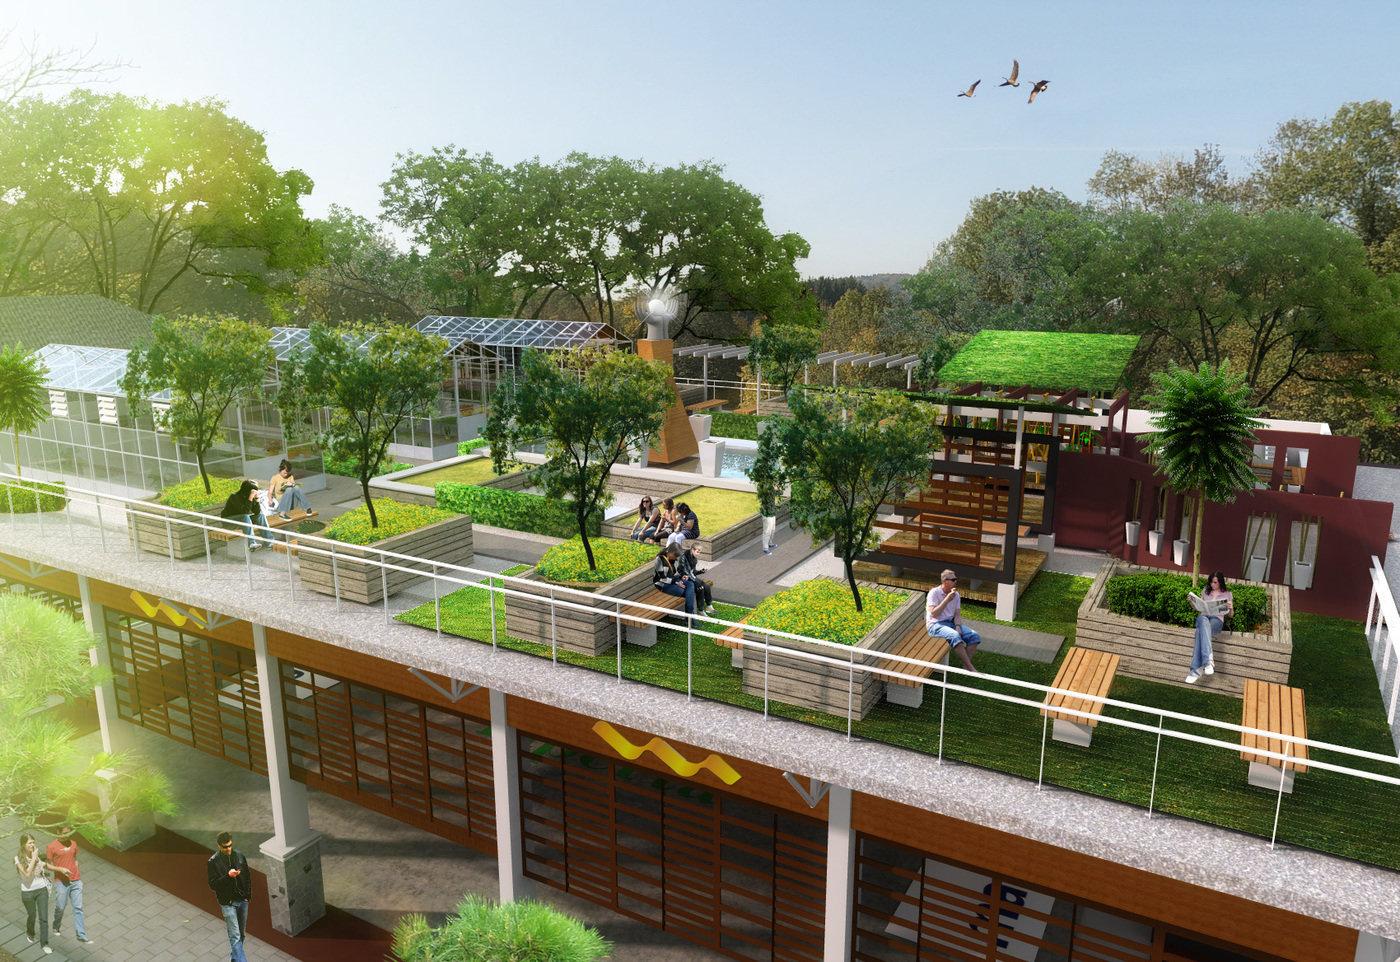 UNPAD Sport Center  Roof Garden by Rheza Nugraha at